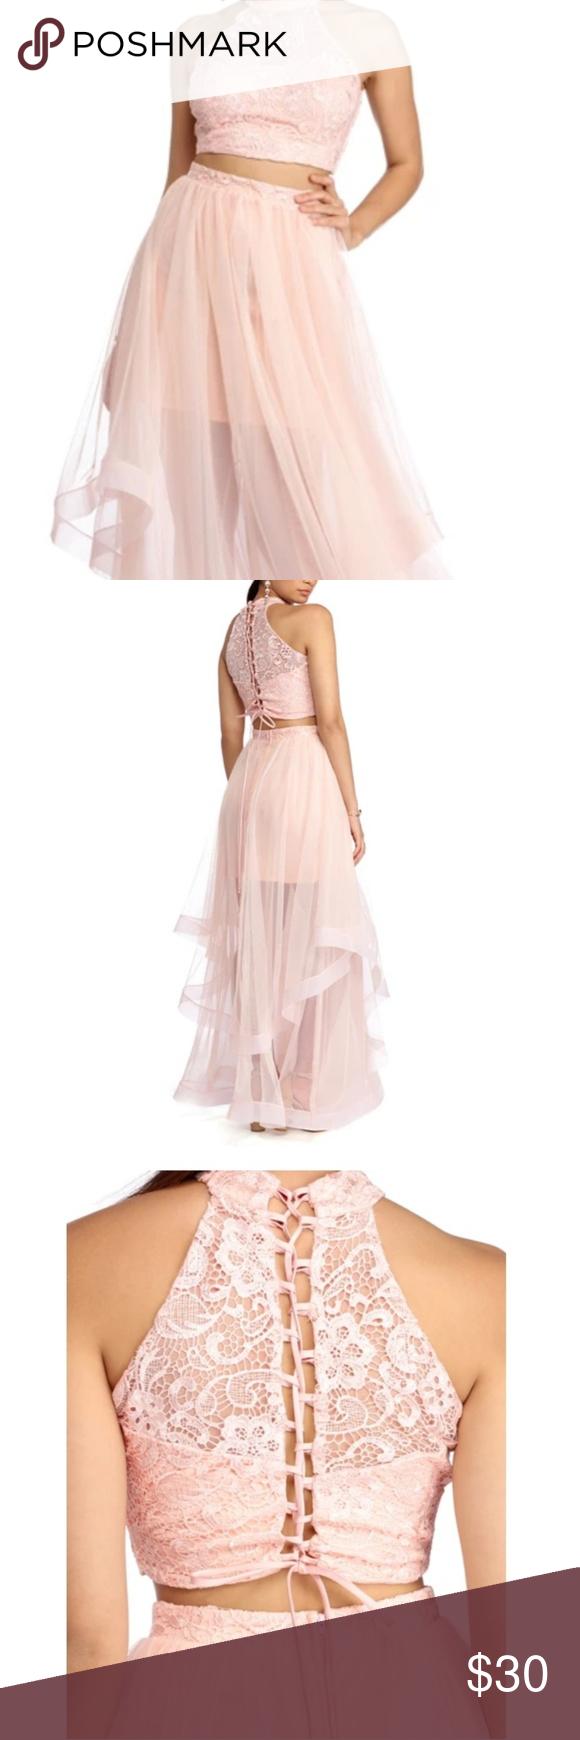 Windsor Pink 2 Piece Formal Dress 2 Piece Formal Dresses Dresses Formal Dresses [ 1740 x 580 Pixel ]